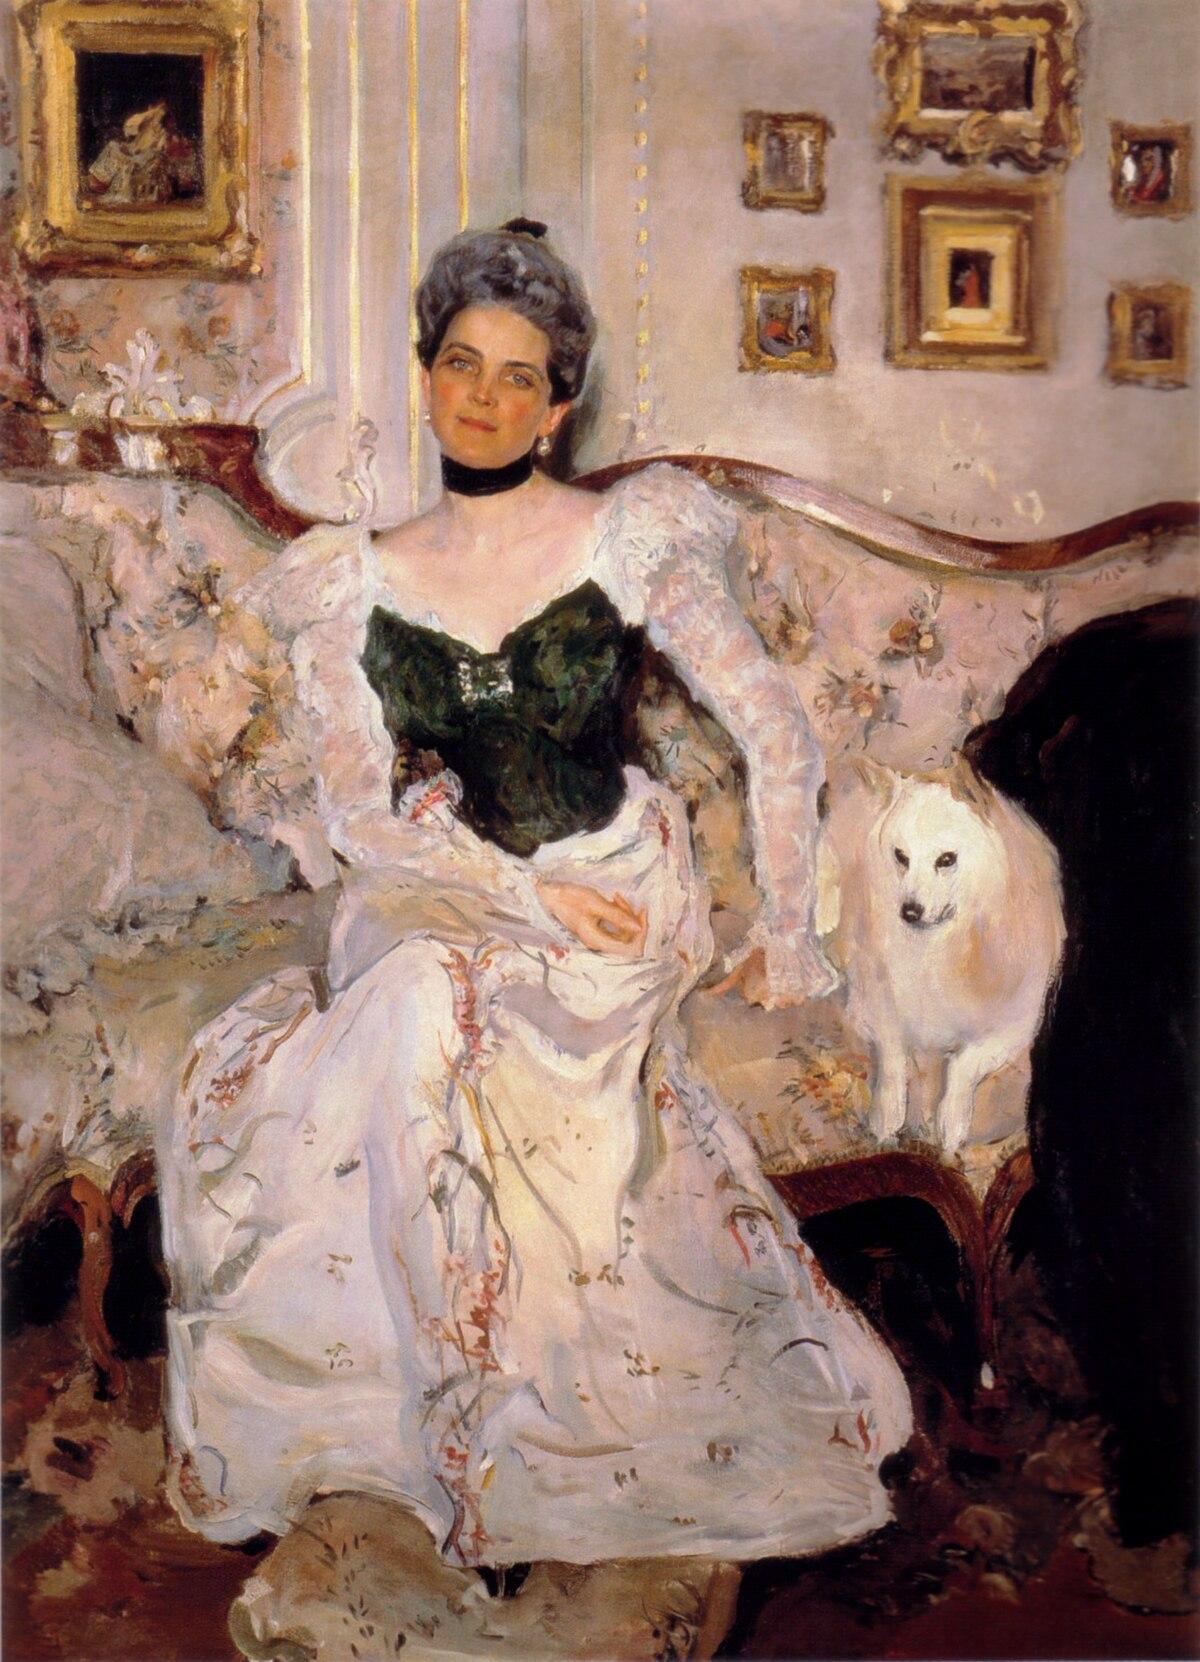 Файл:Zinaida Yusupova by V.Serov (1900-1902, GRM).jpg — Википедия